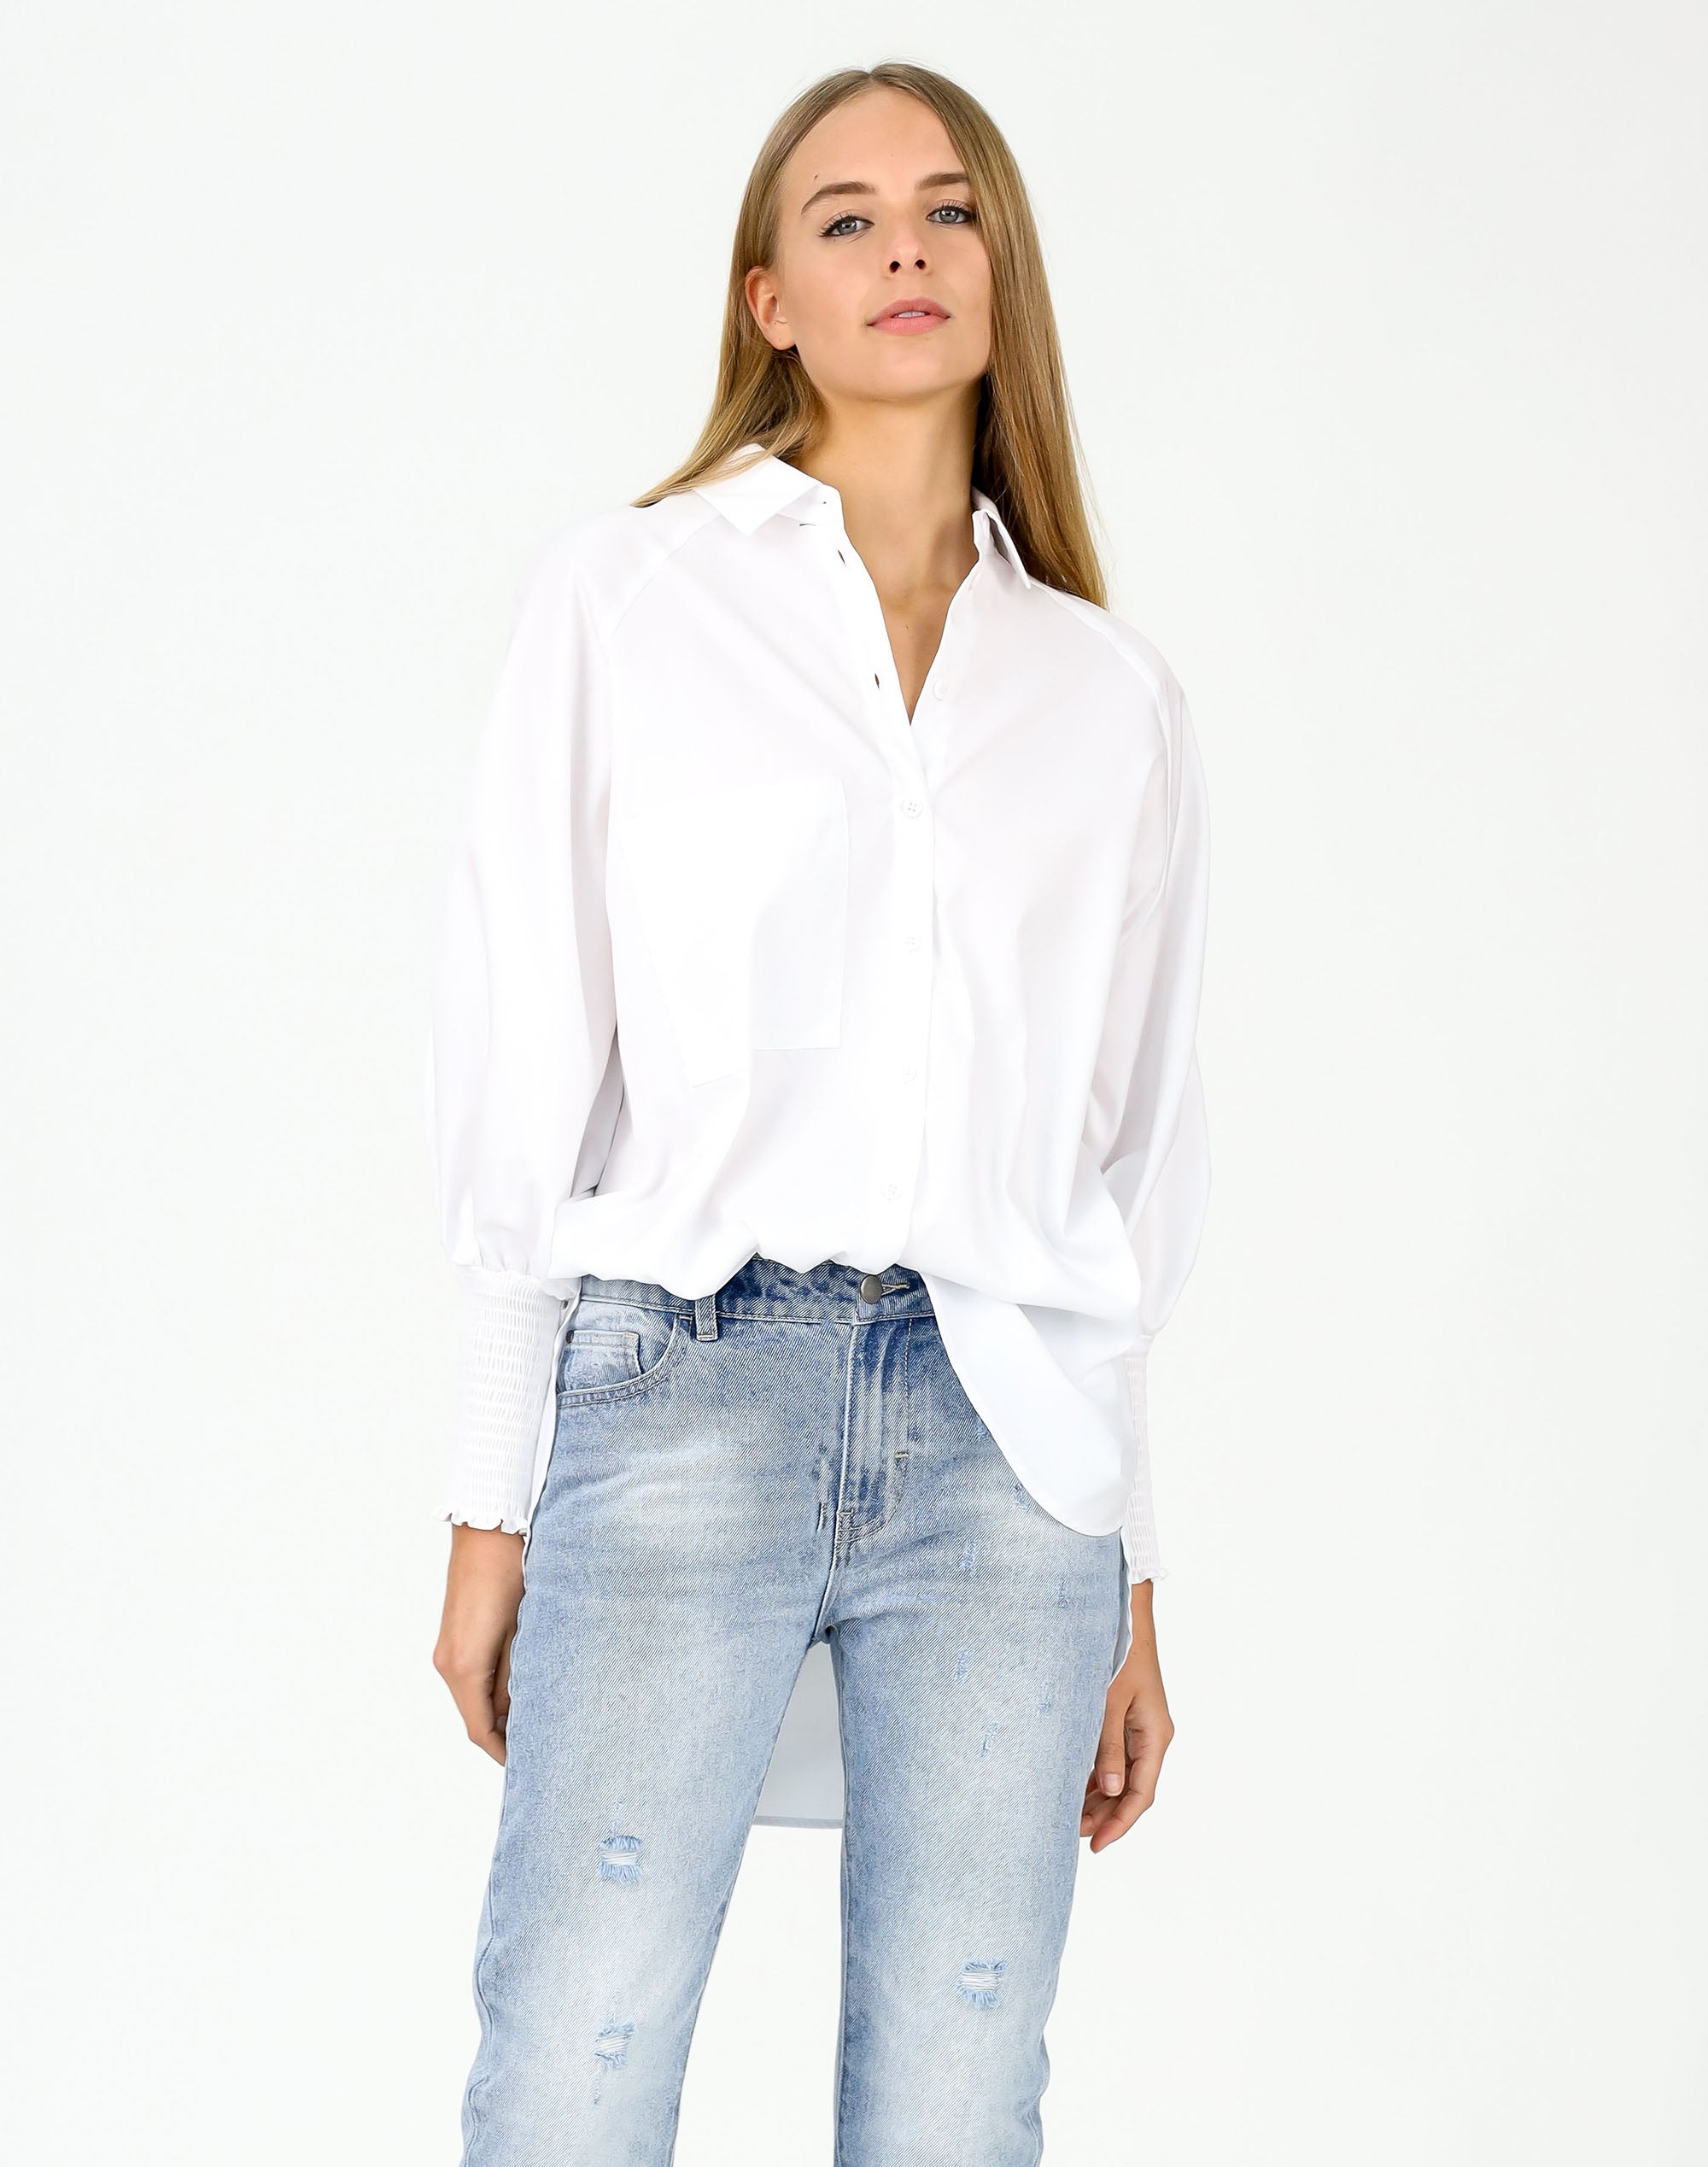 Bystander Shirt